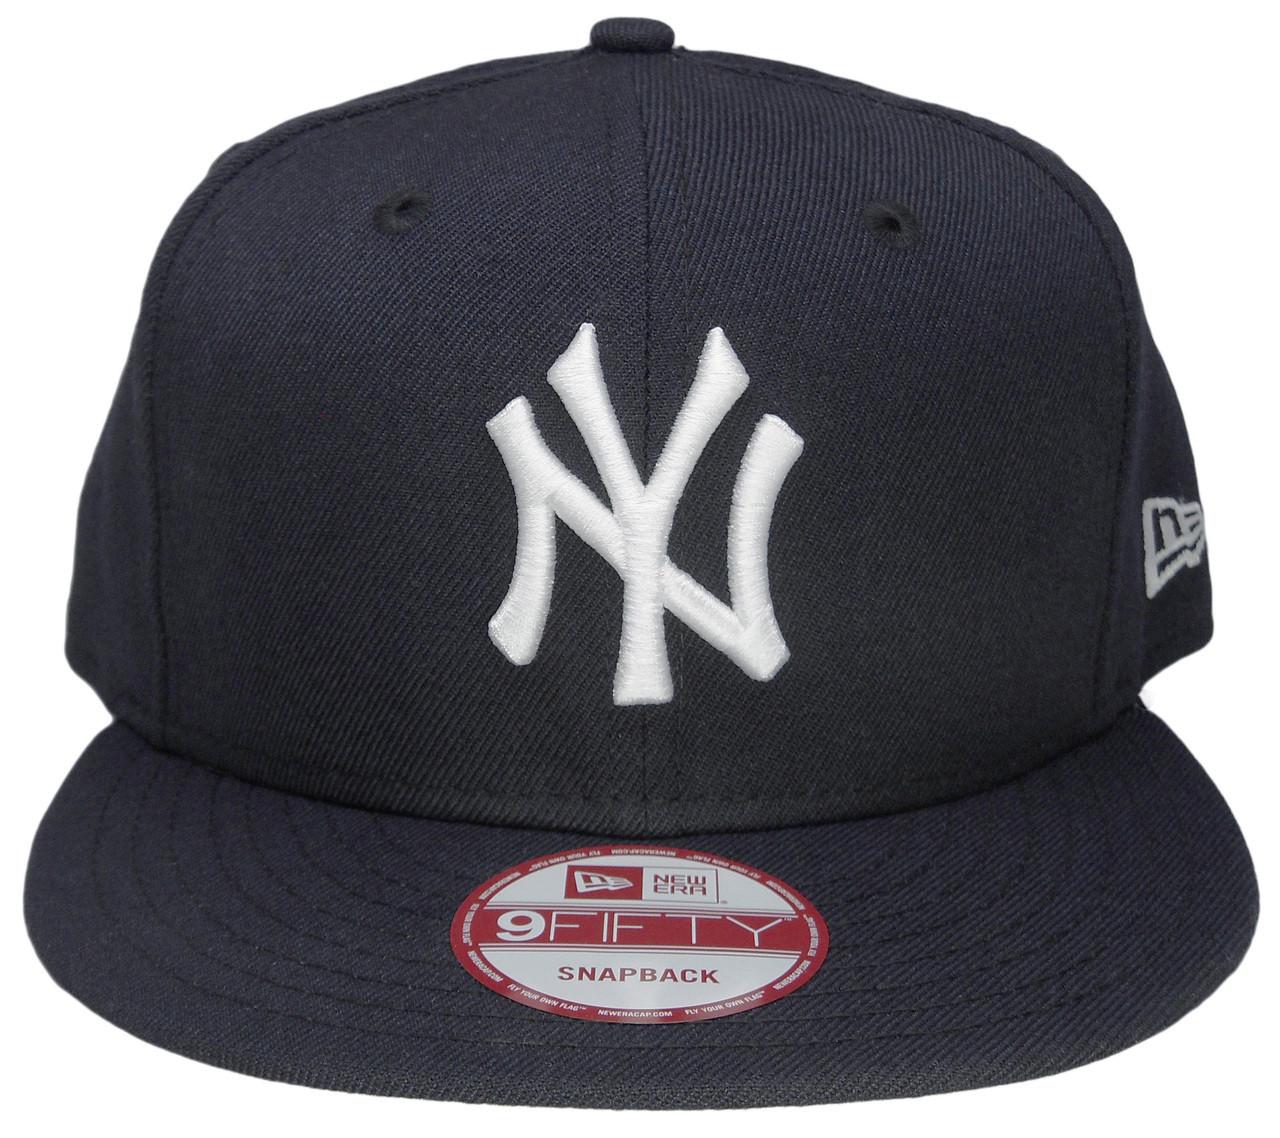 bda8be91e00 New York Yankees New Era Custom Gray Bottom Snapback Hat - Navy Blue ...